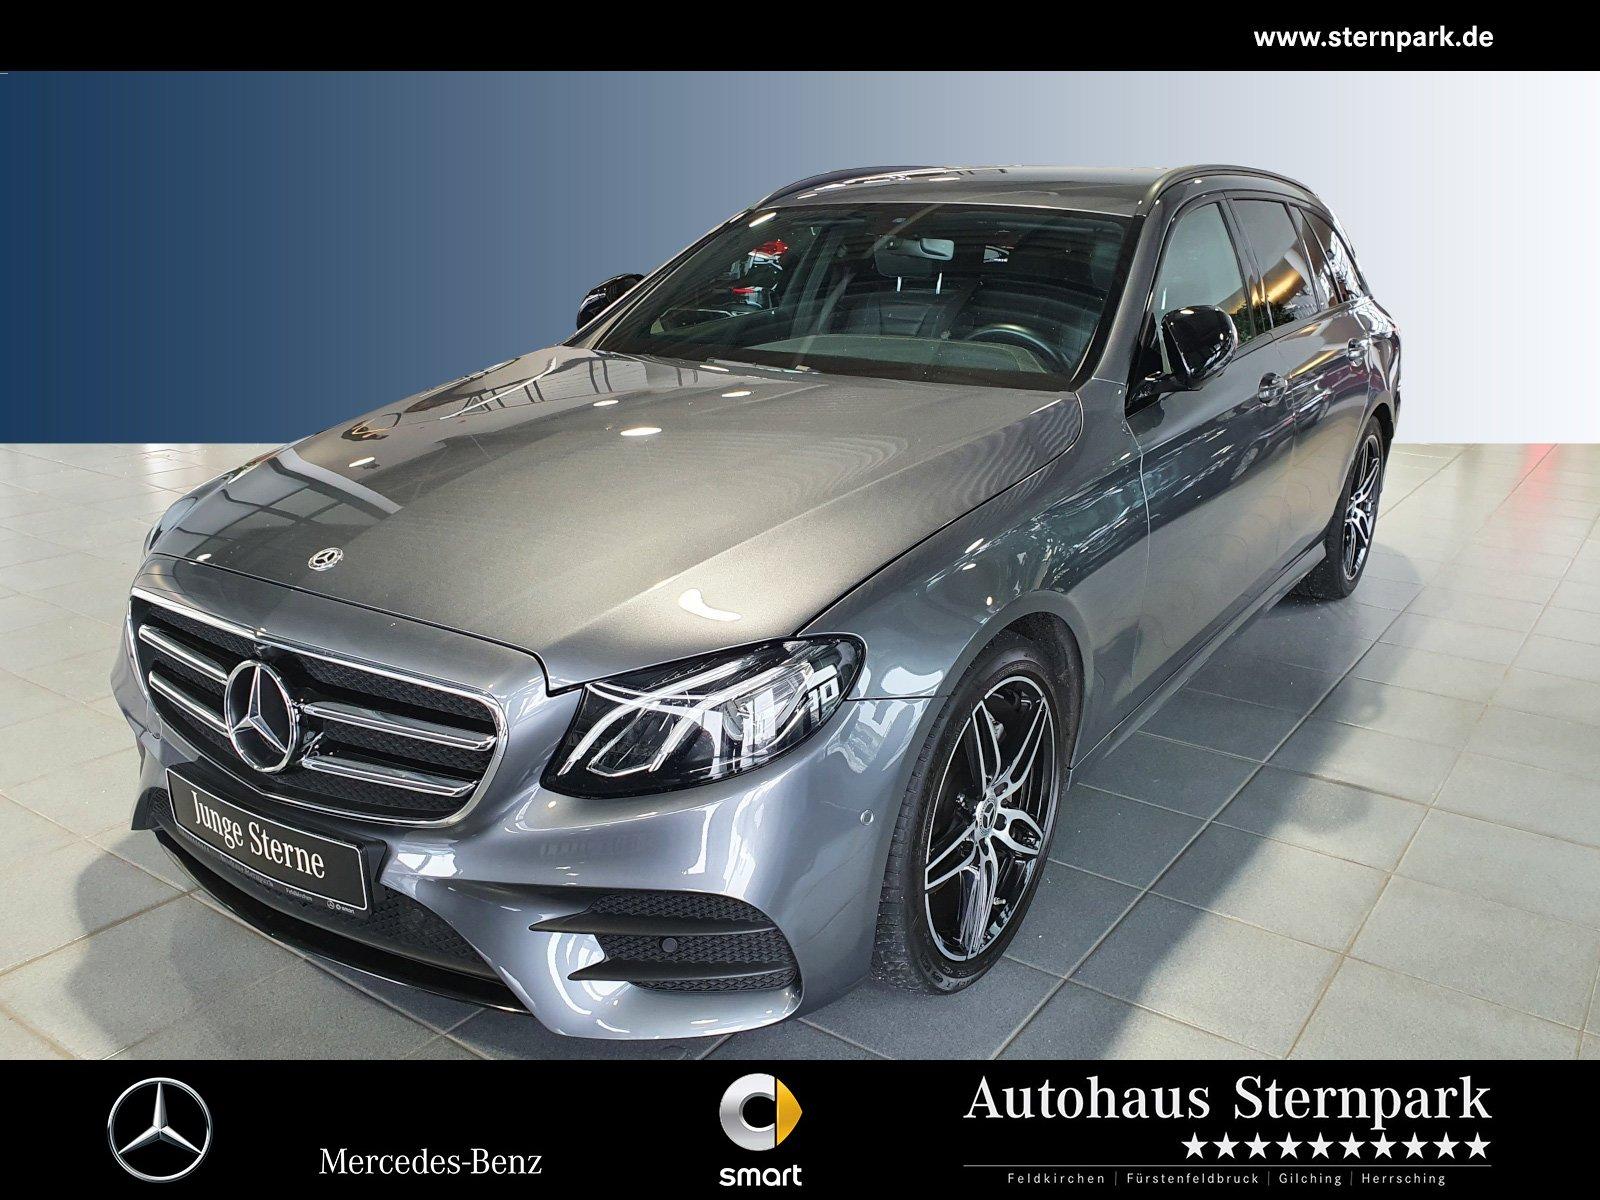 Mercedes-Benz E 300 d T AMG Navi+LED+360° Kamera+Night+Easy++, Jahr 2018, Diesel